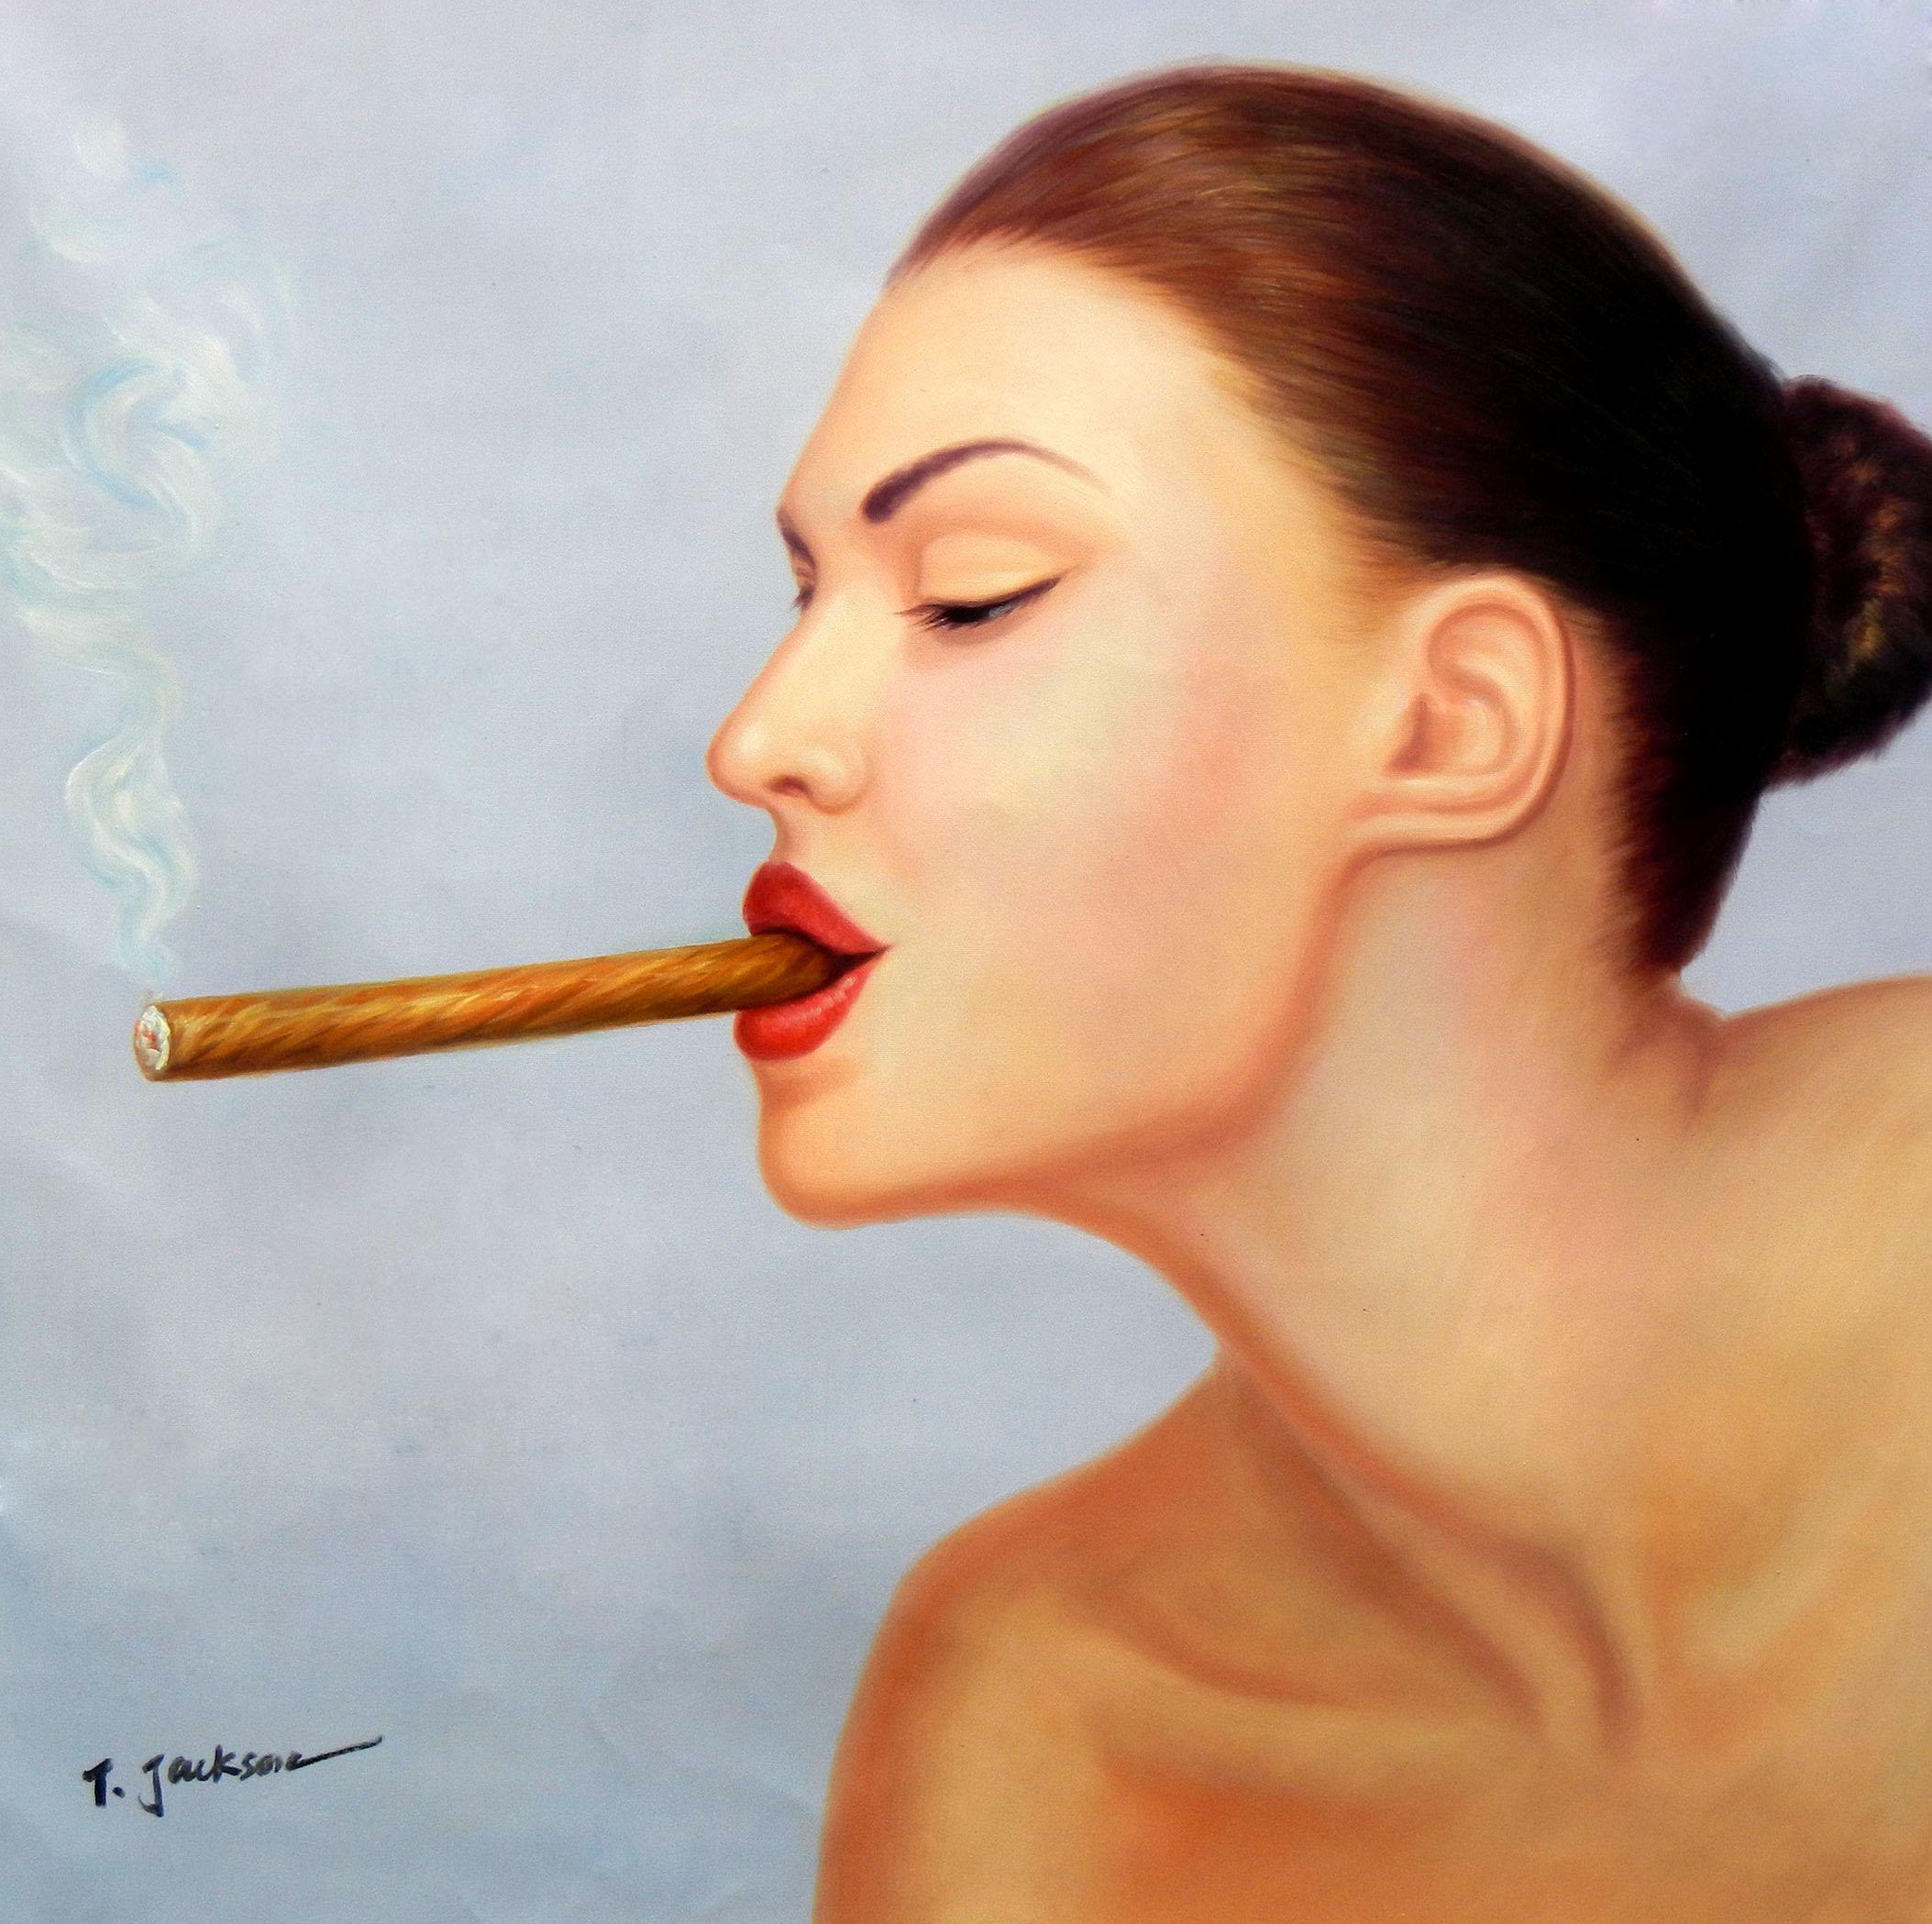 Modern Art - Frau mit Cohiba Zigarre g96815 80x80cm exquisites Ölgemälde